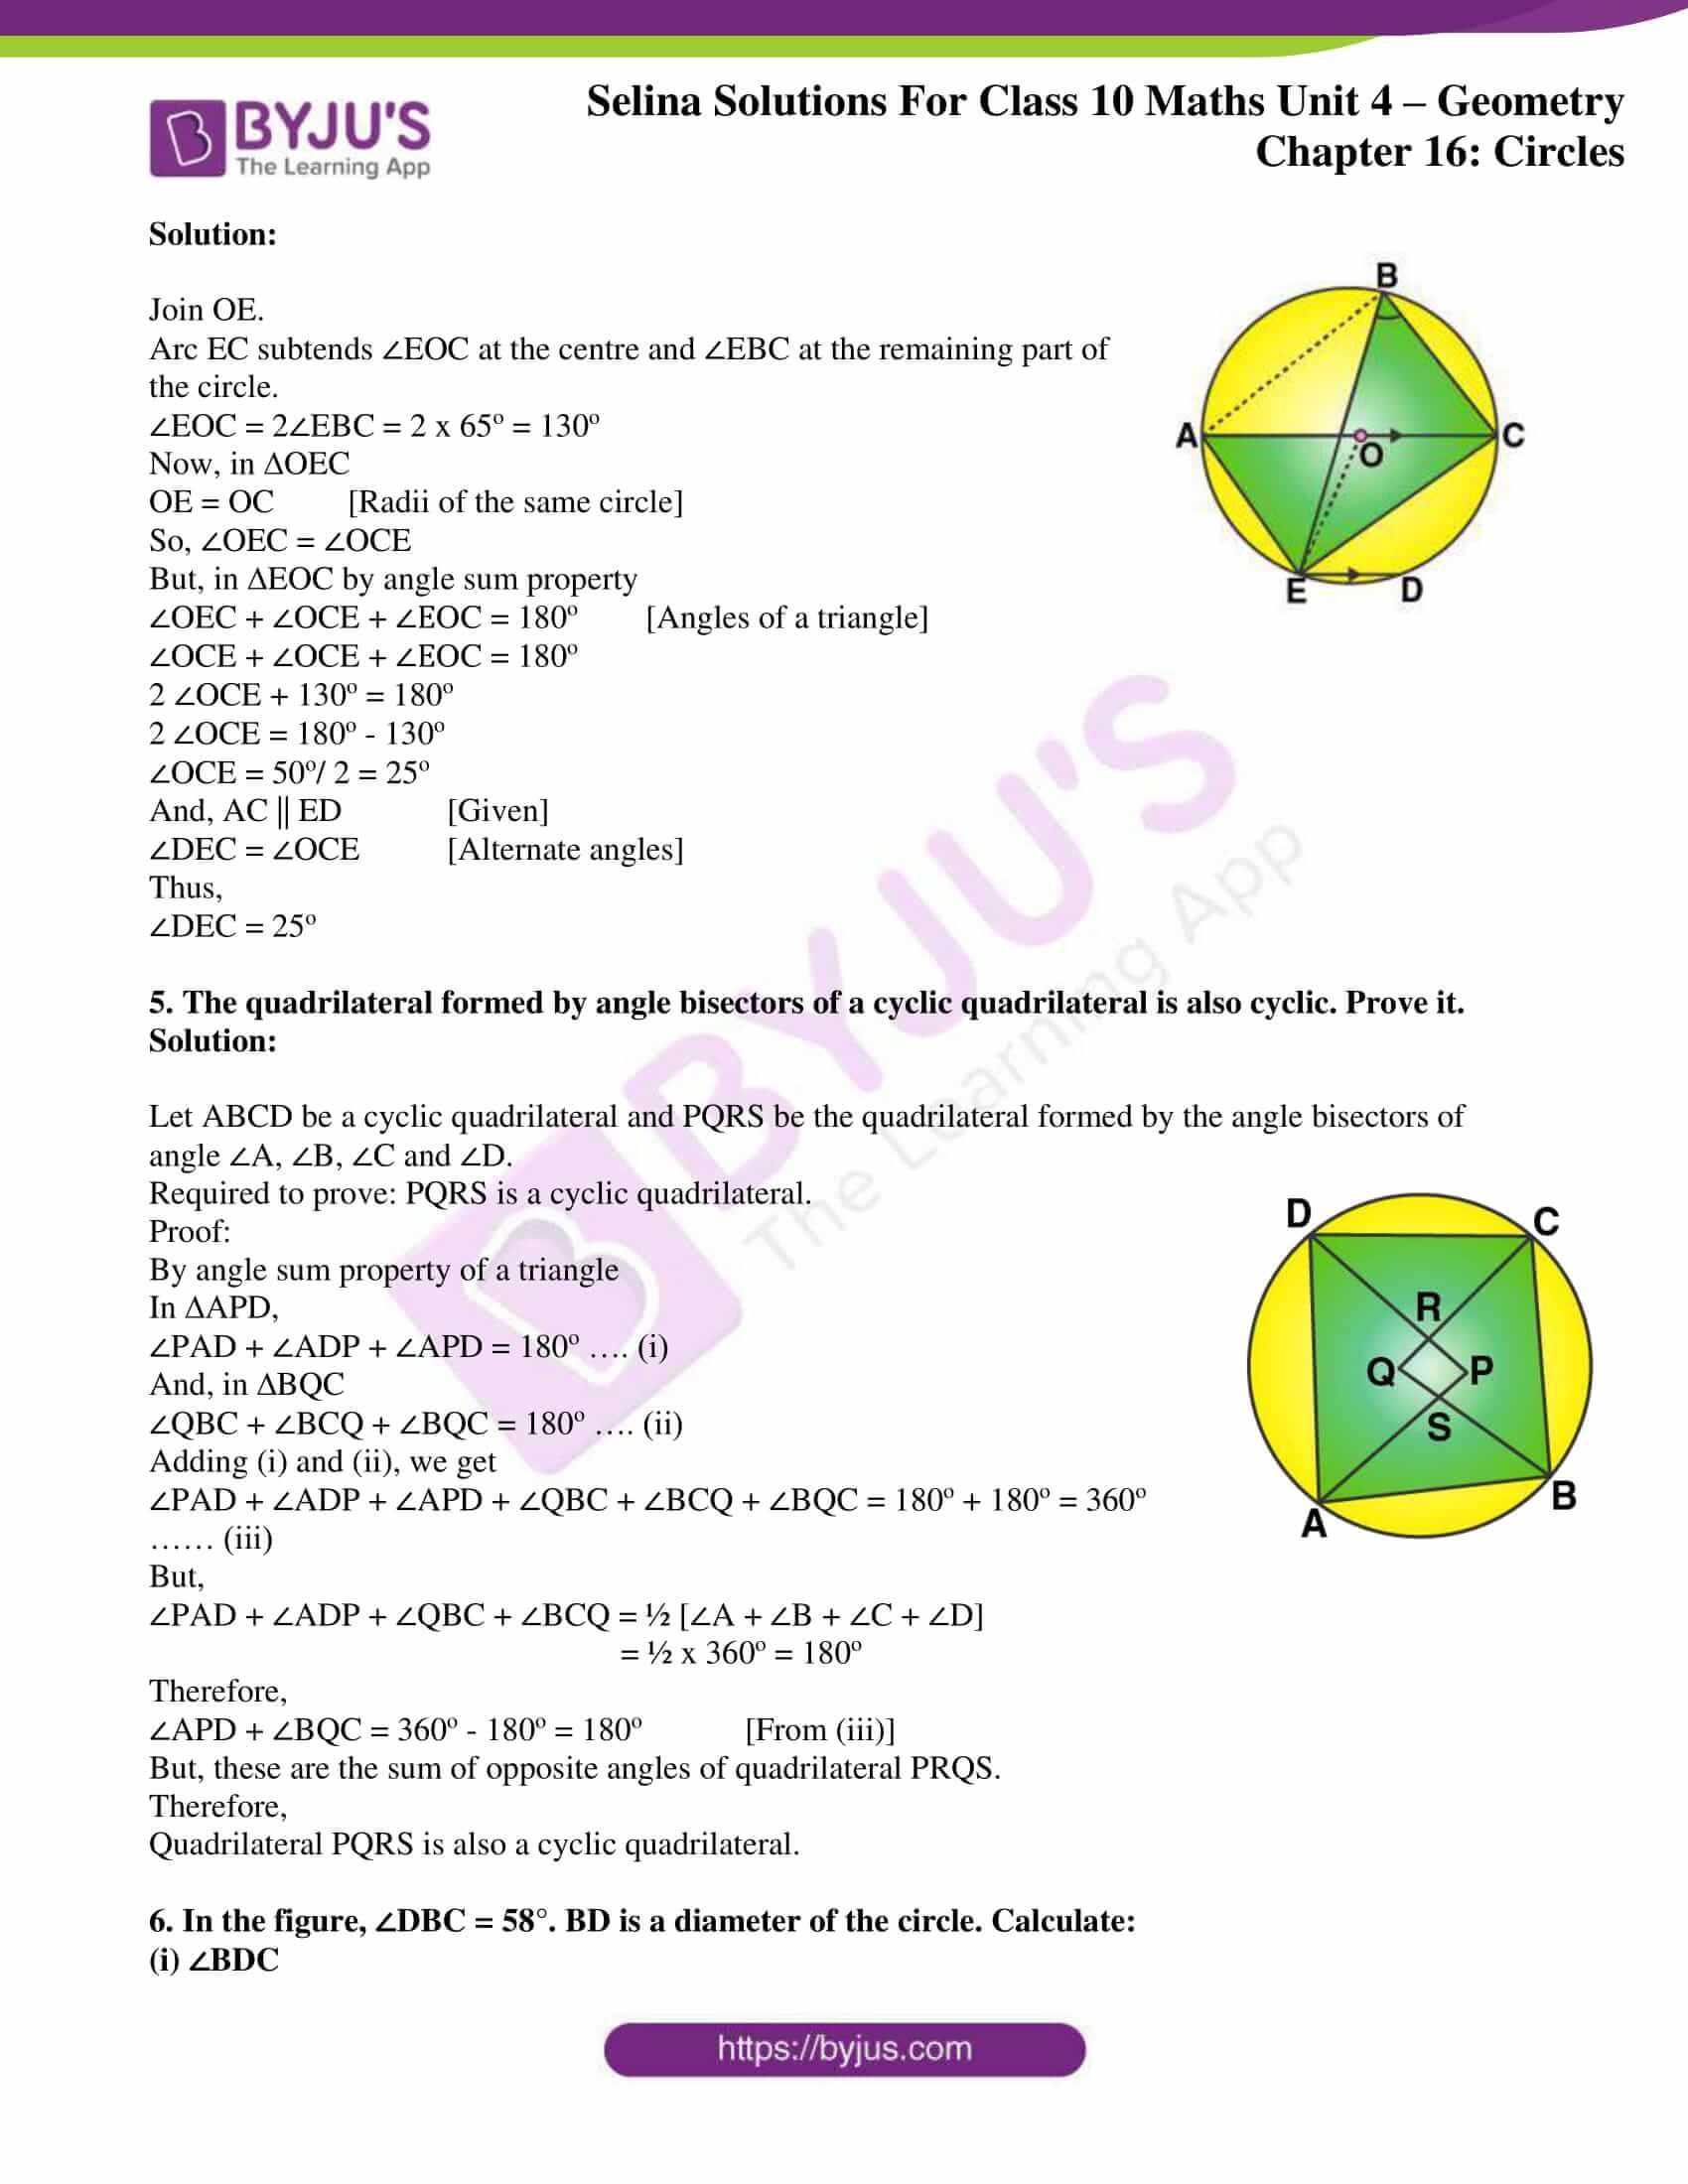 selina-sol-maths-class-10-ch-17-ex-c-3